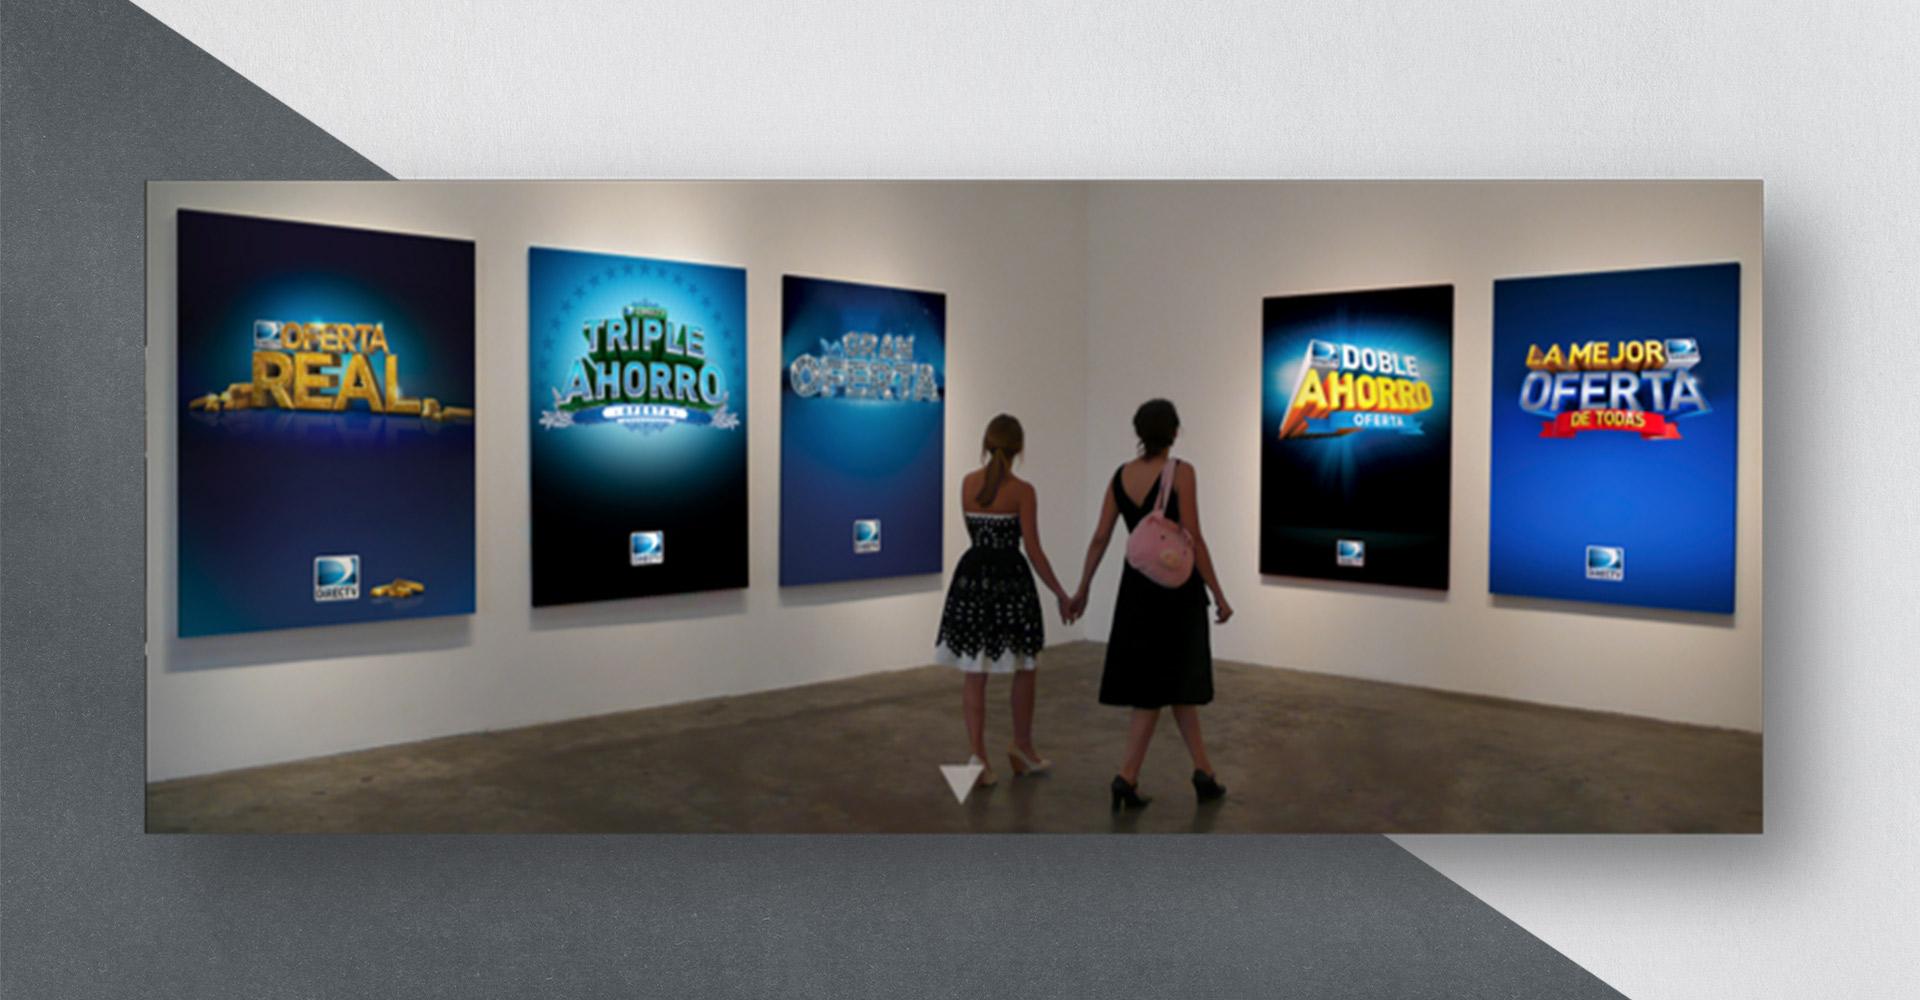 DiectTV digital display